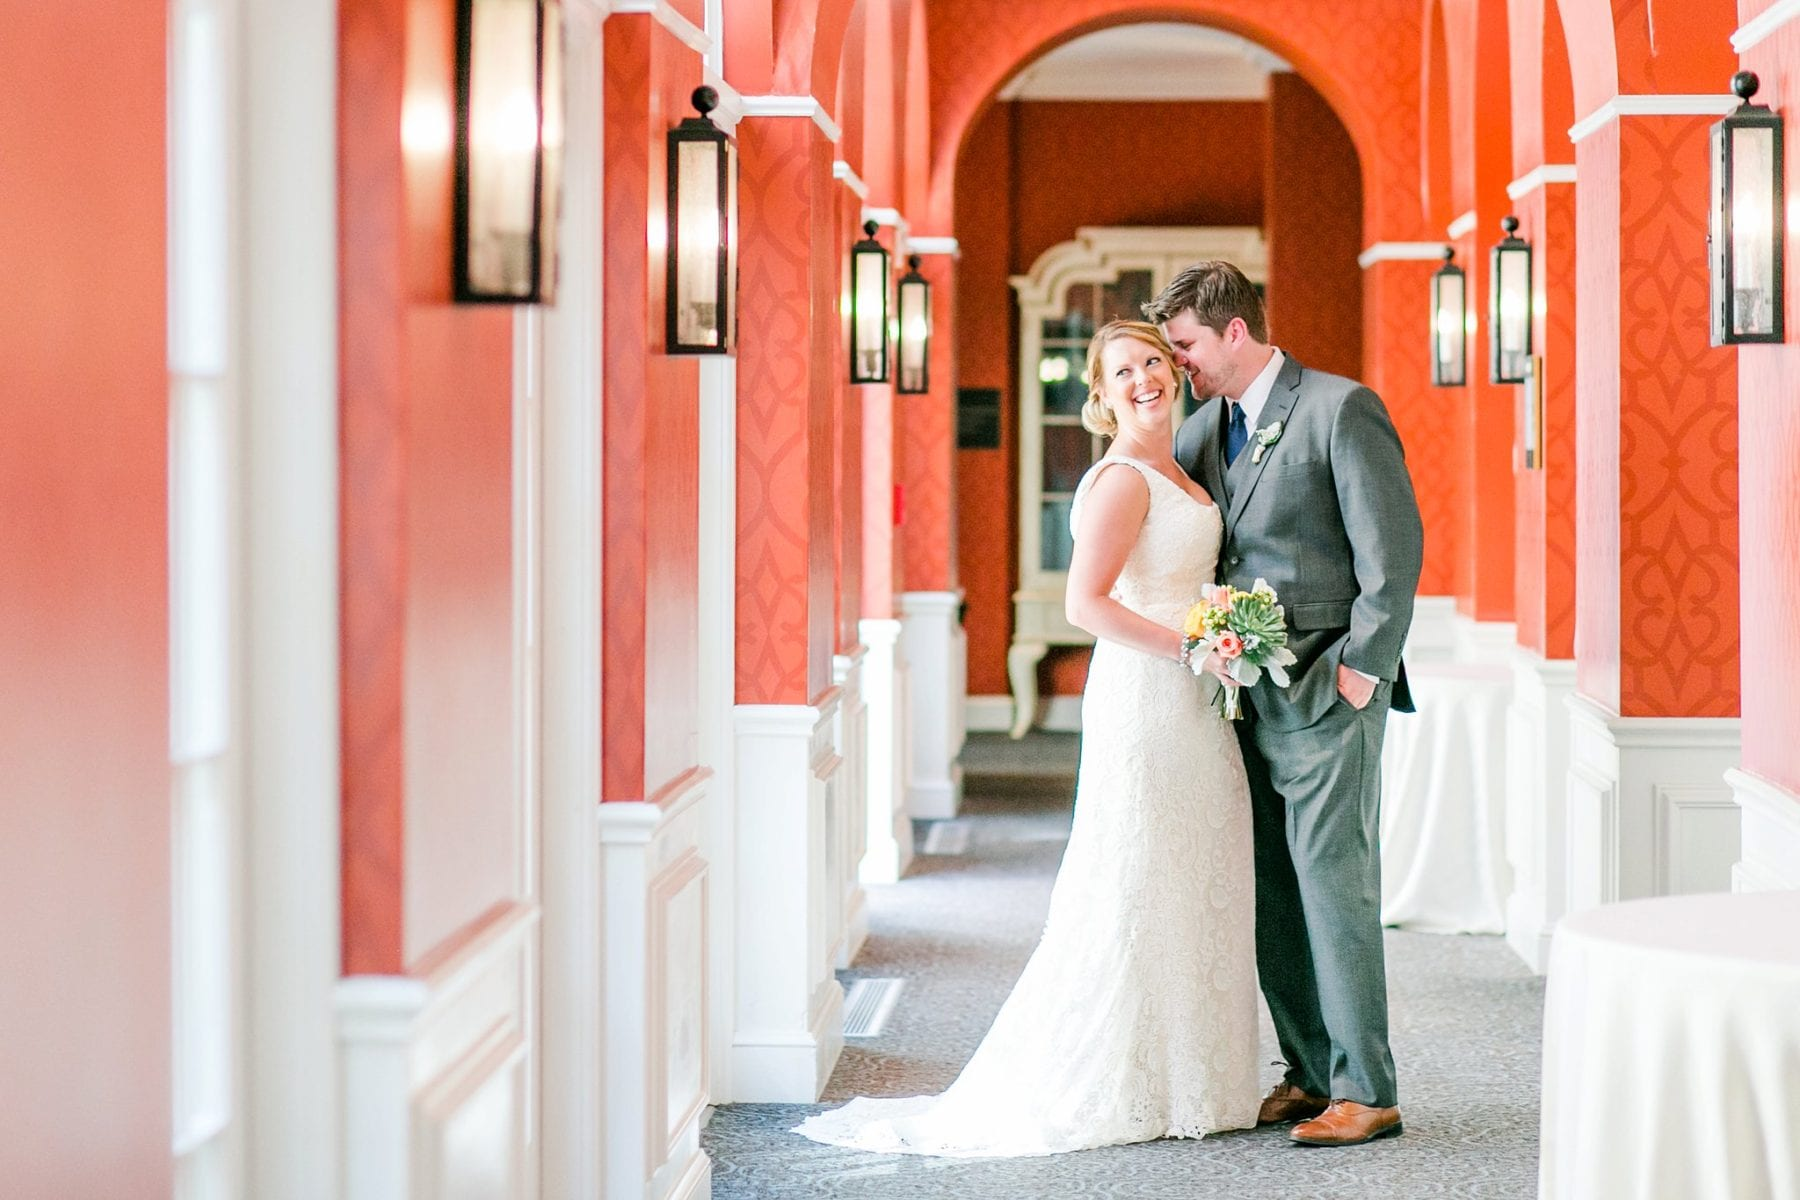 Hotel Monaco Wedding Photos Virginia Wedding Photographer Megan Kelsey Photography Kevin & Morgan-175.JPG